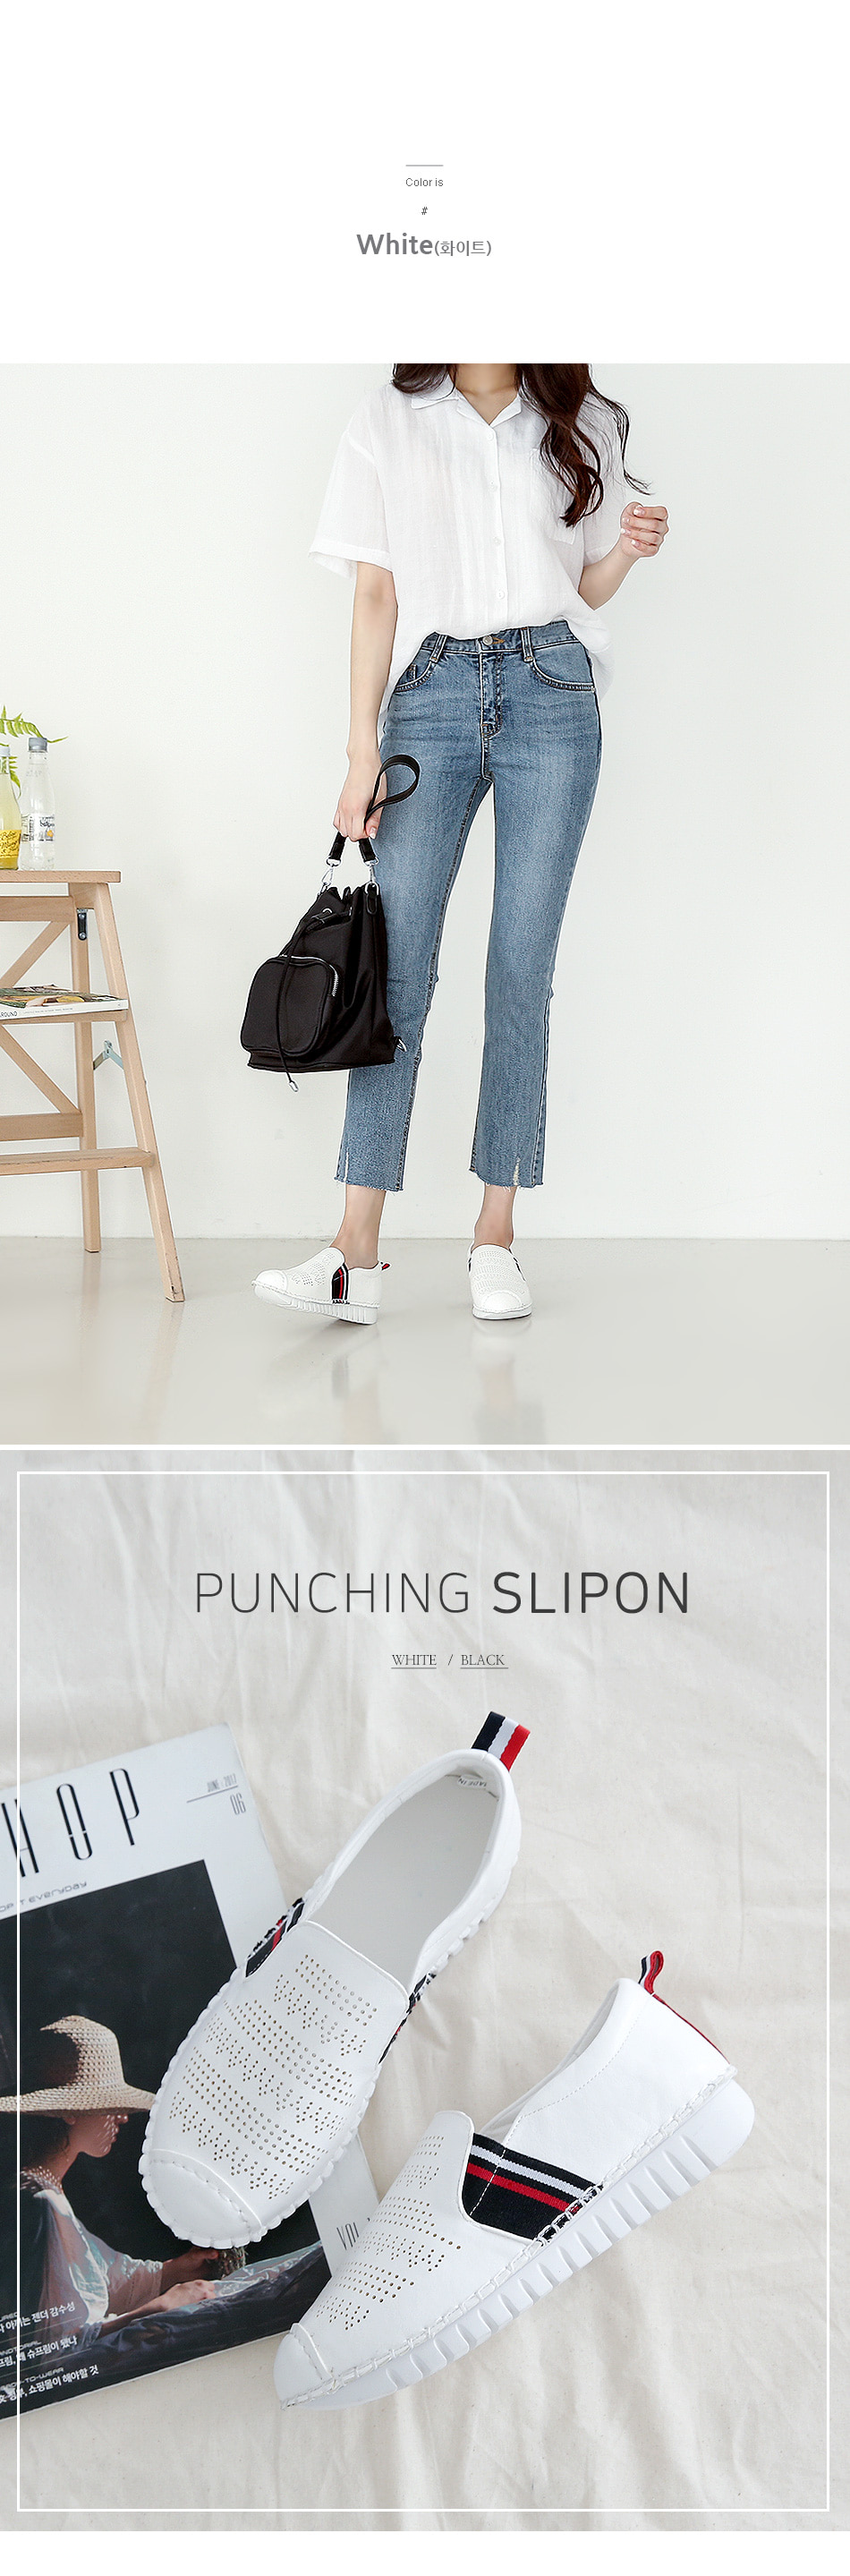 Note punching slip-on 2.5cm